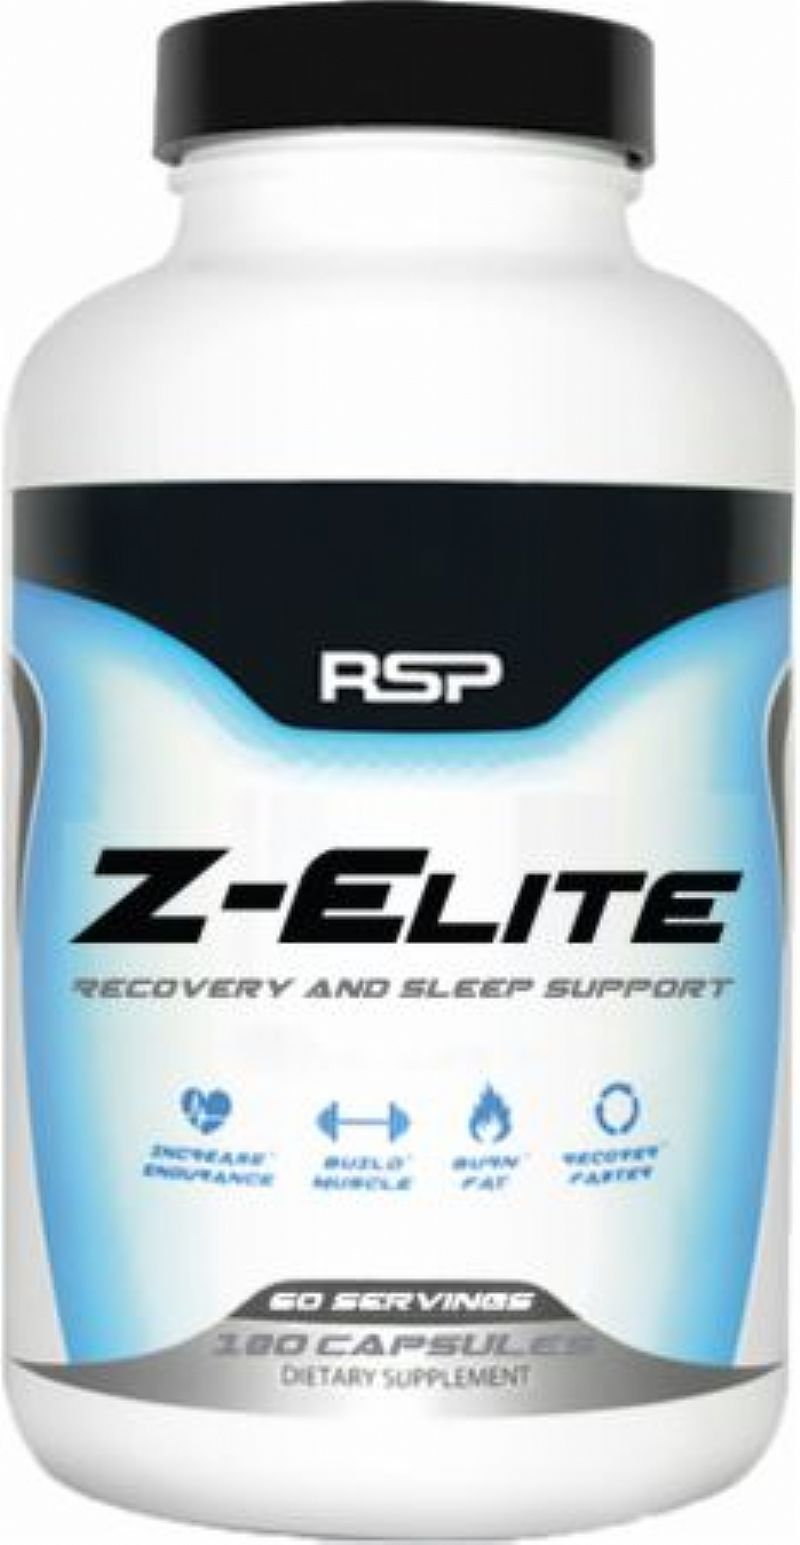 Z-Elite - RSP Nutrition (180 Capsulas)